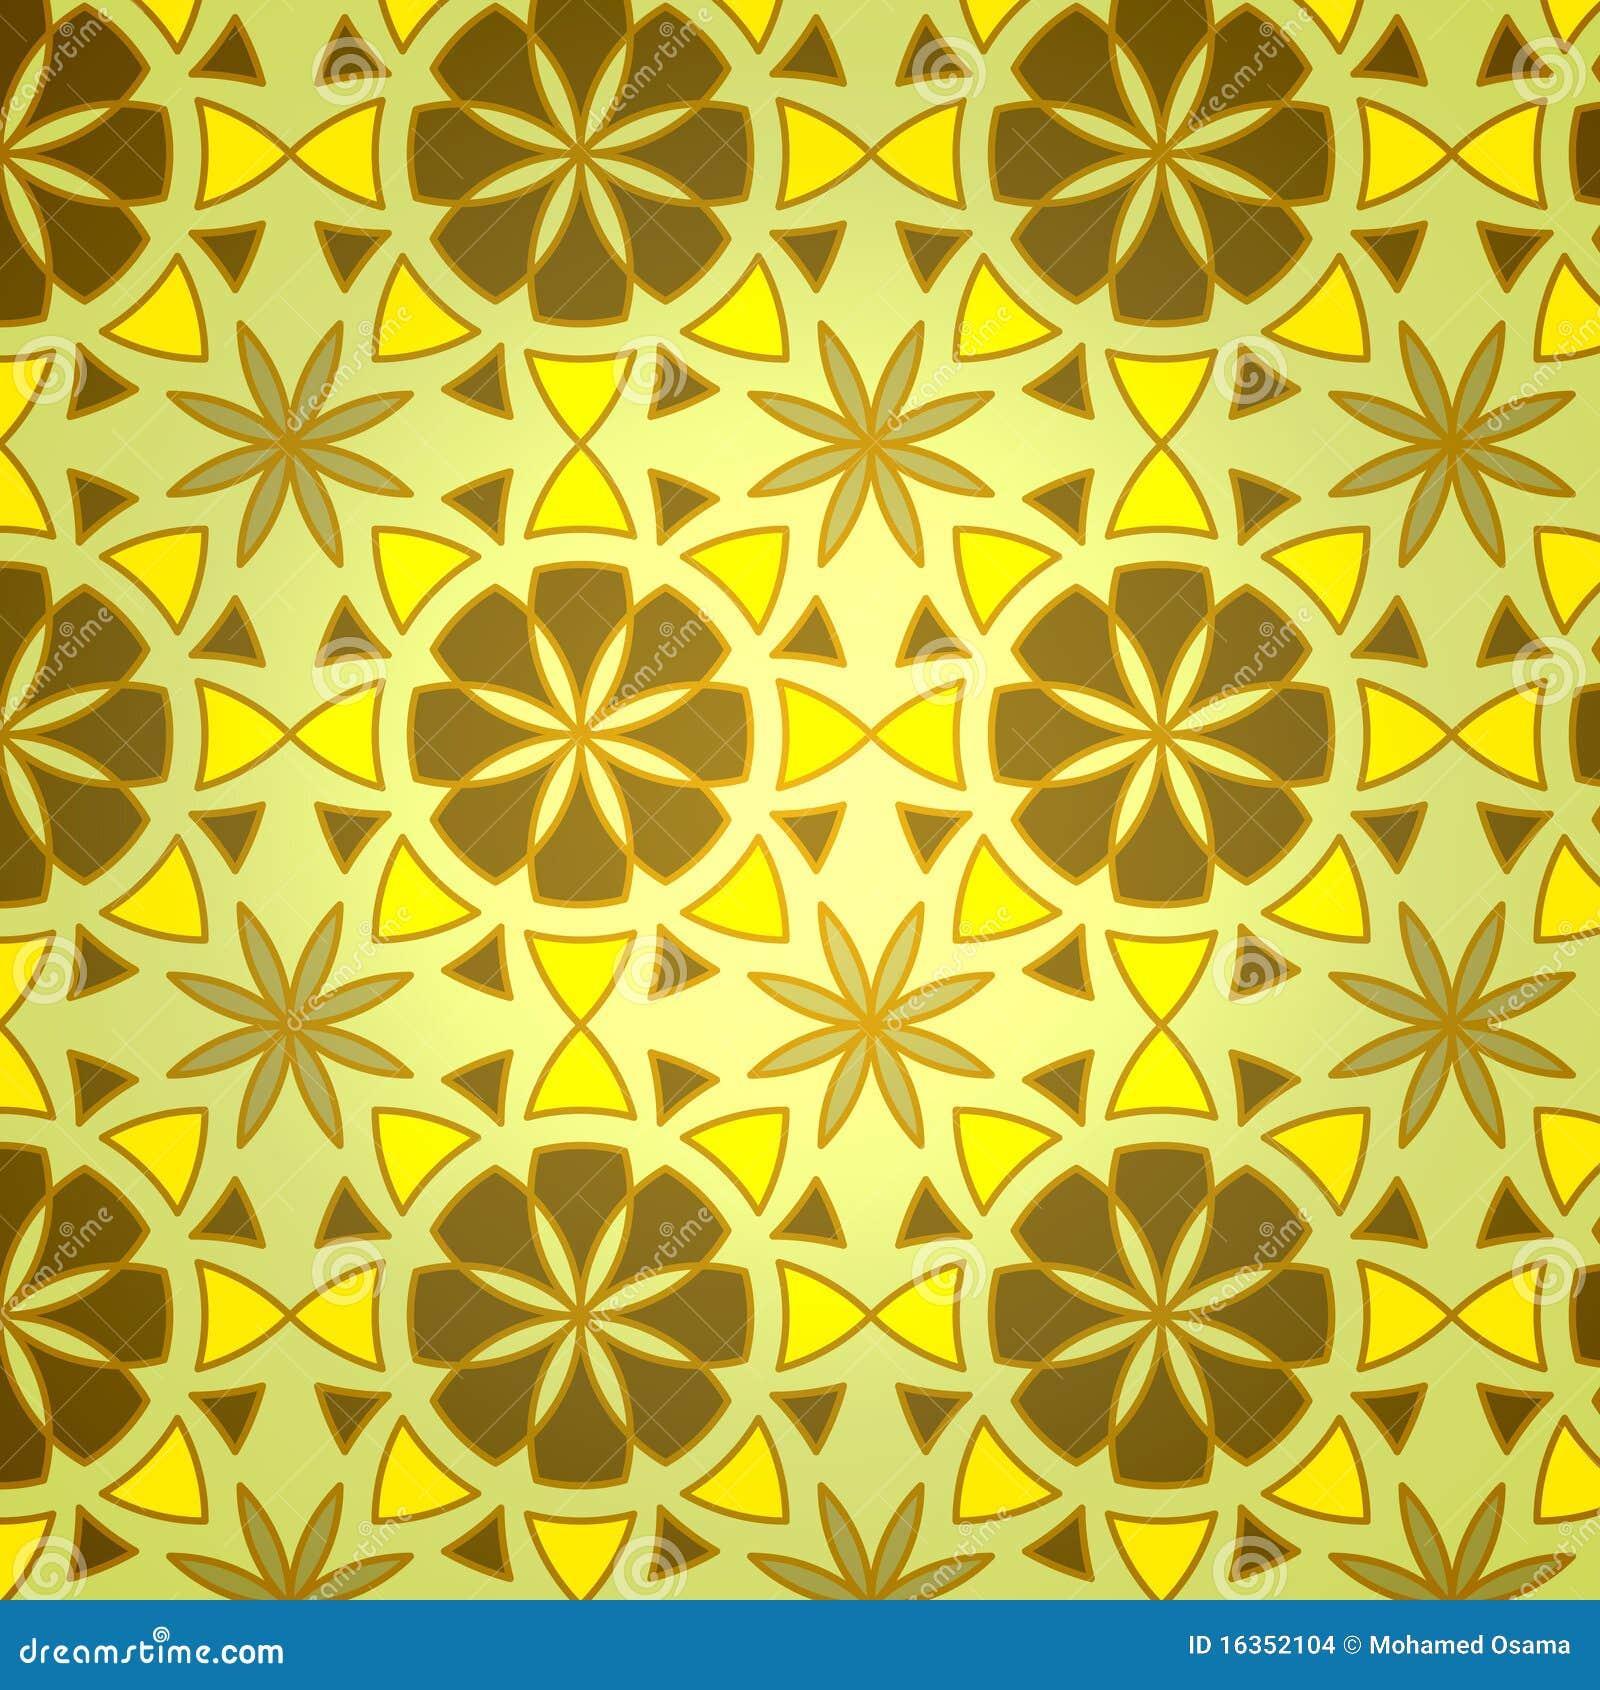 Vector Geometric Flower Seamless Pattern